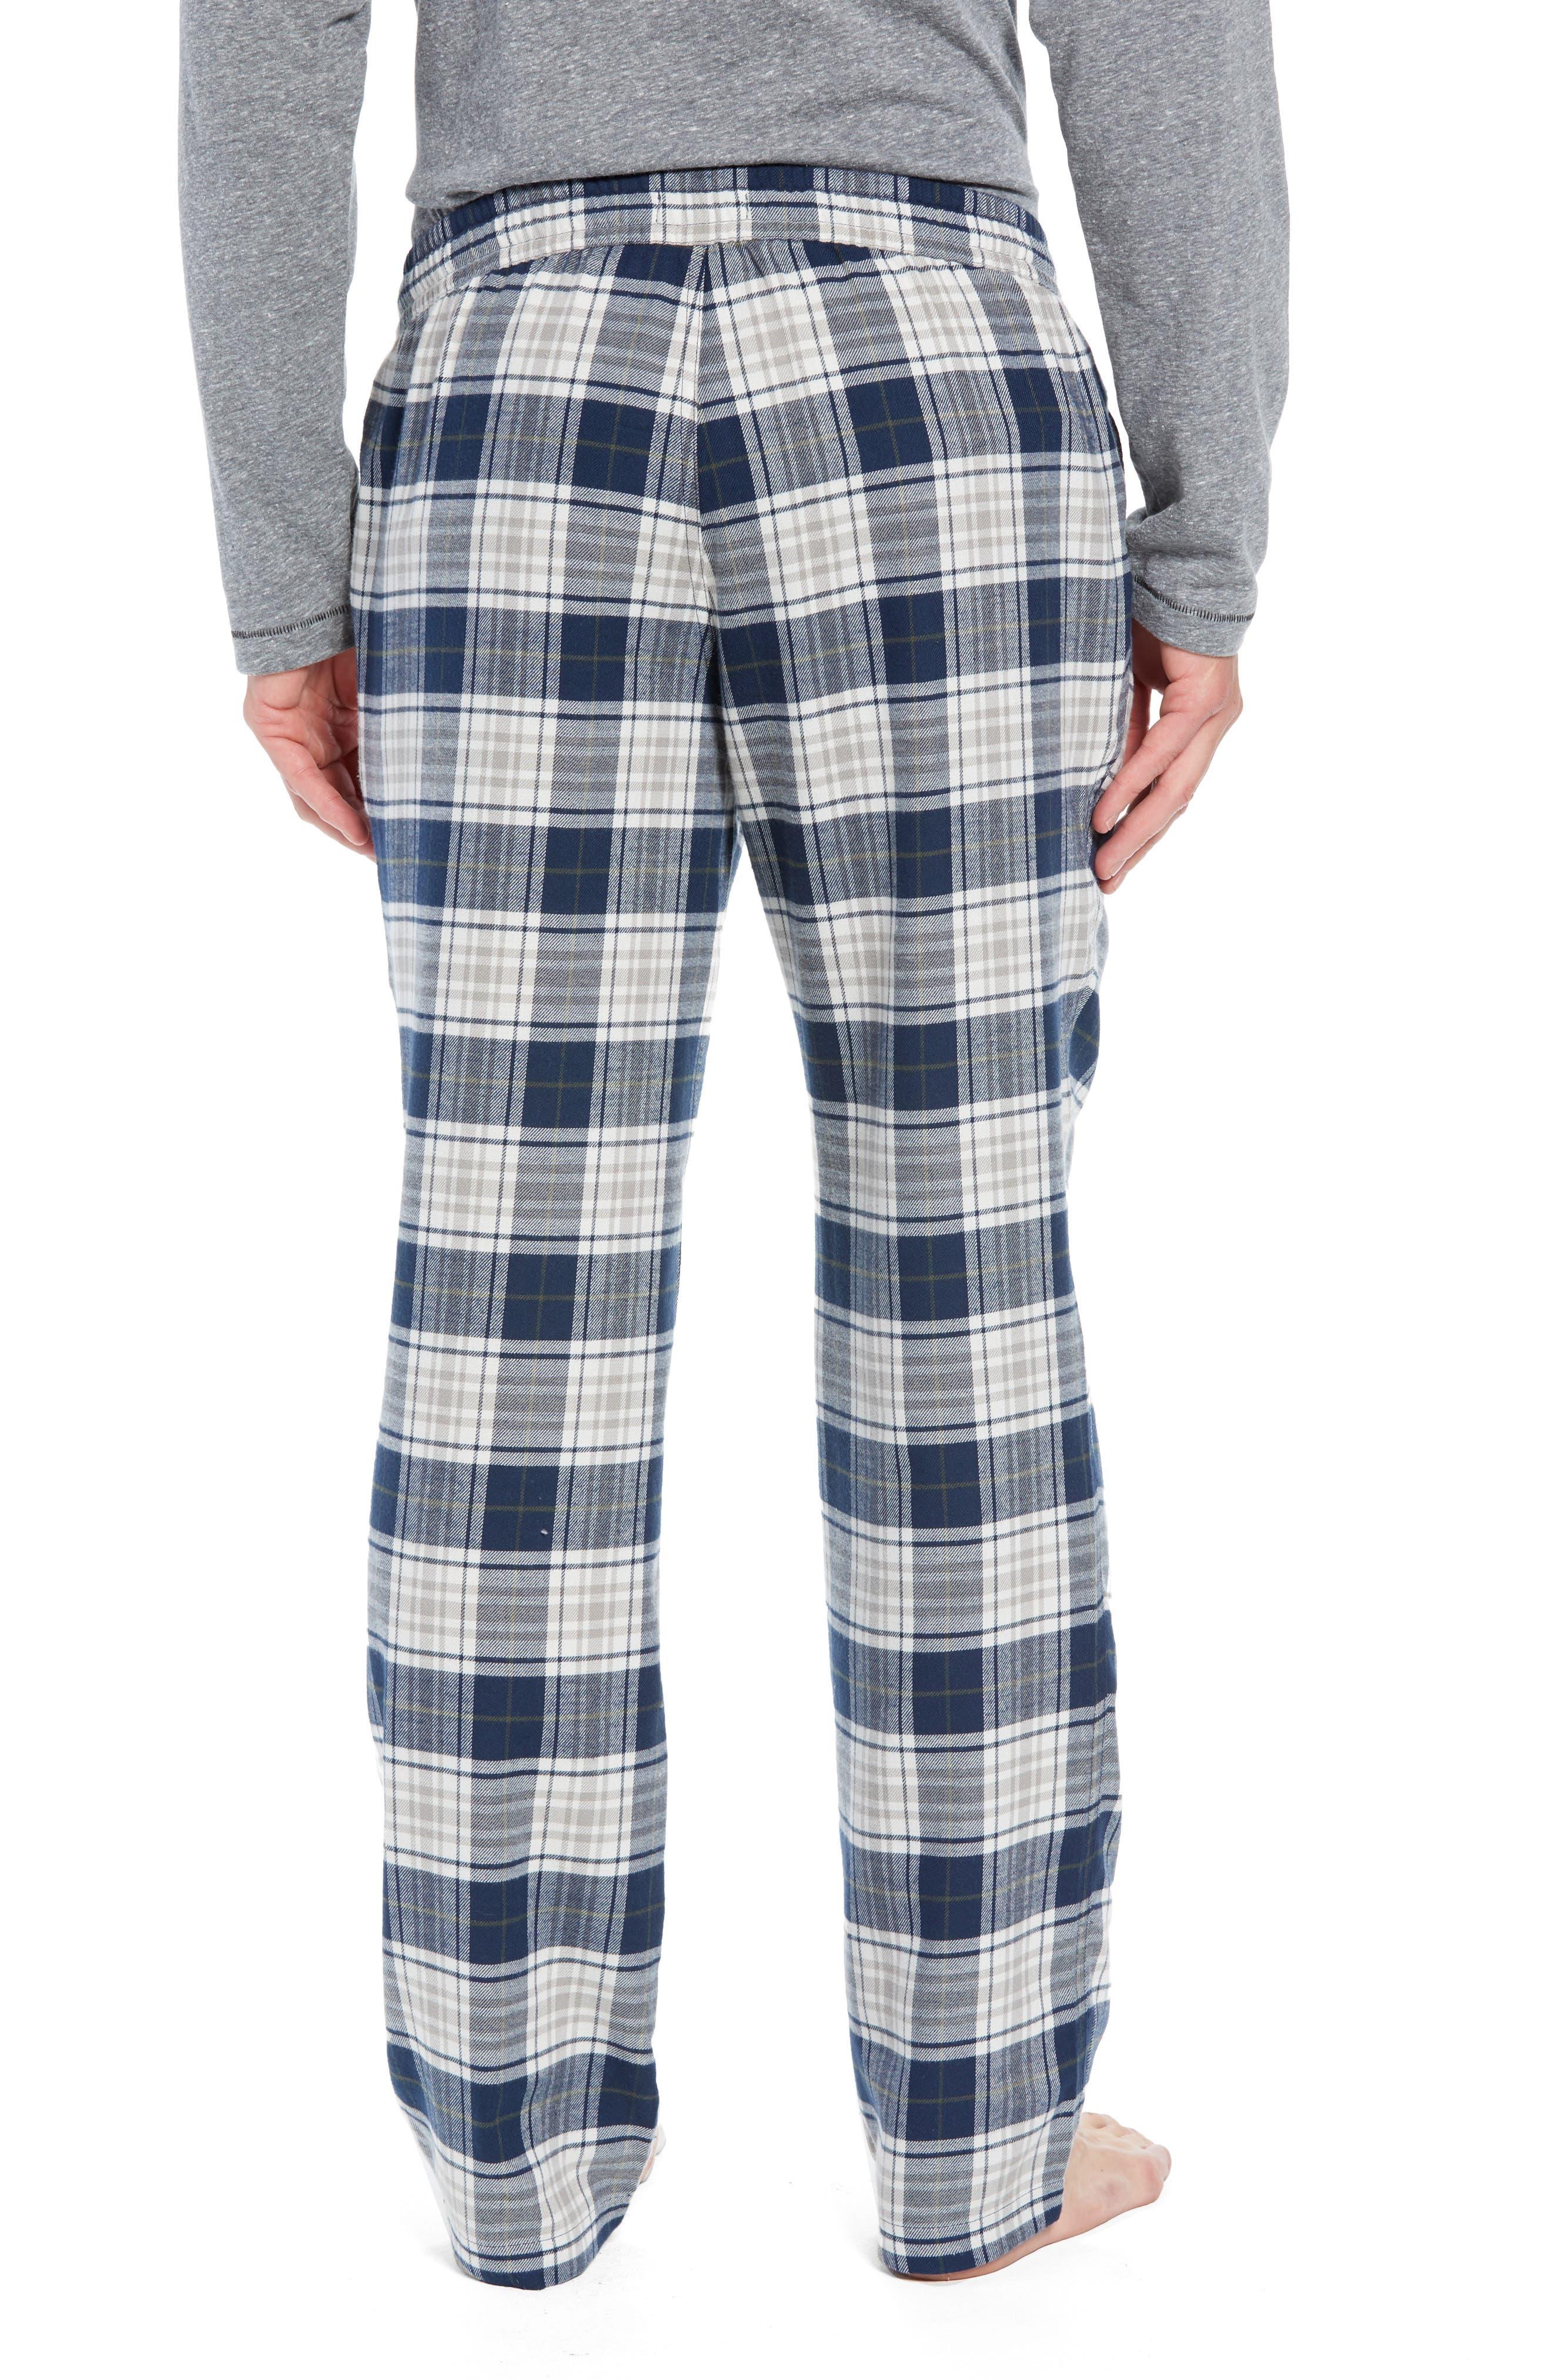 Steiner Pajama Set,                             Alternate thumbnail 2, color,                             NAVY/ GREY HEATHER